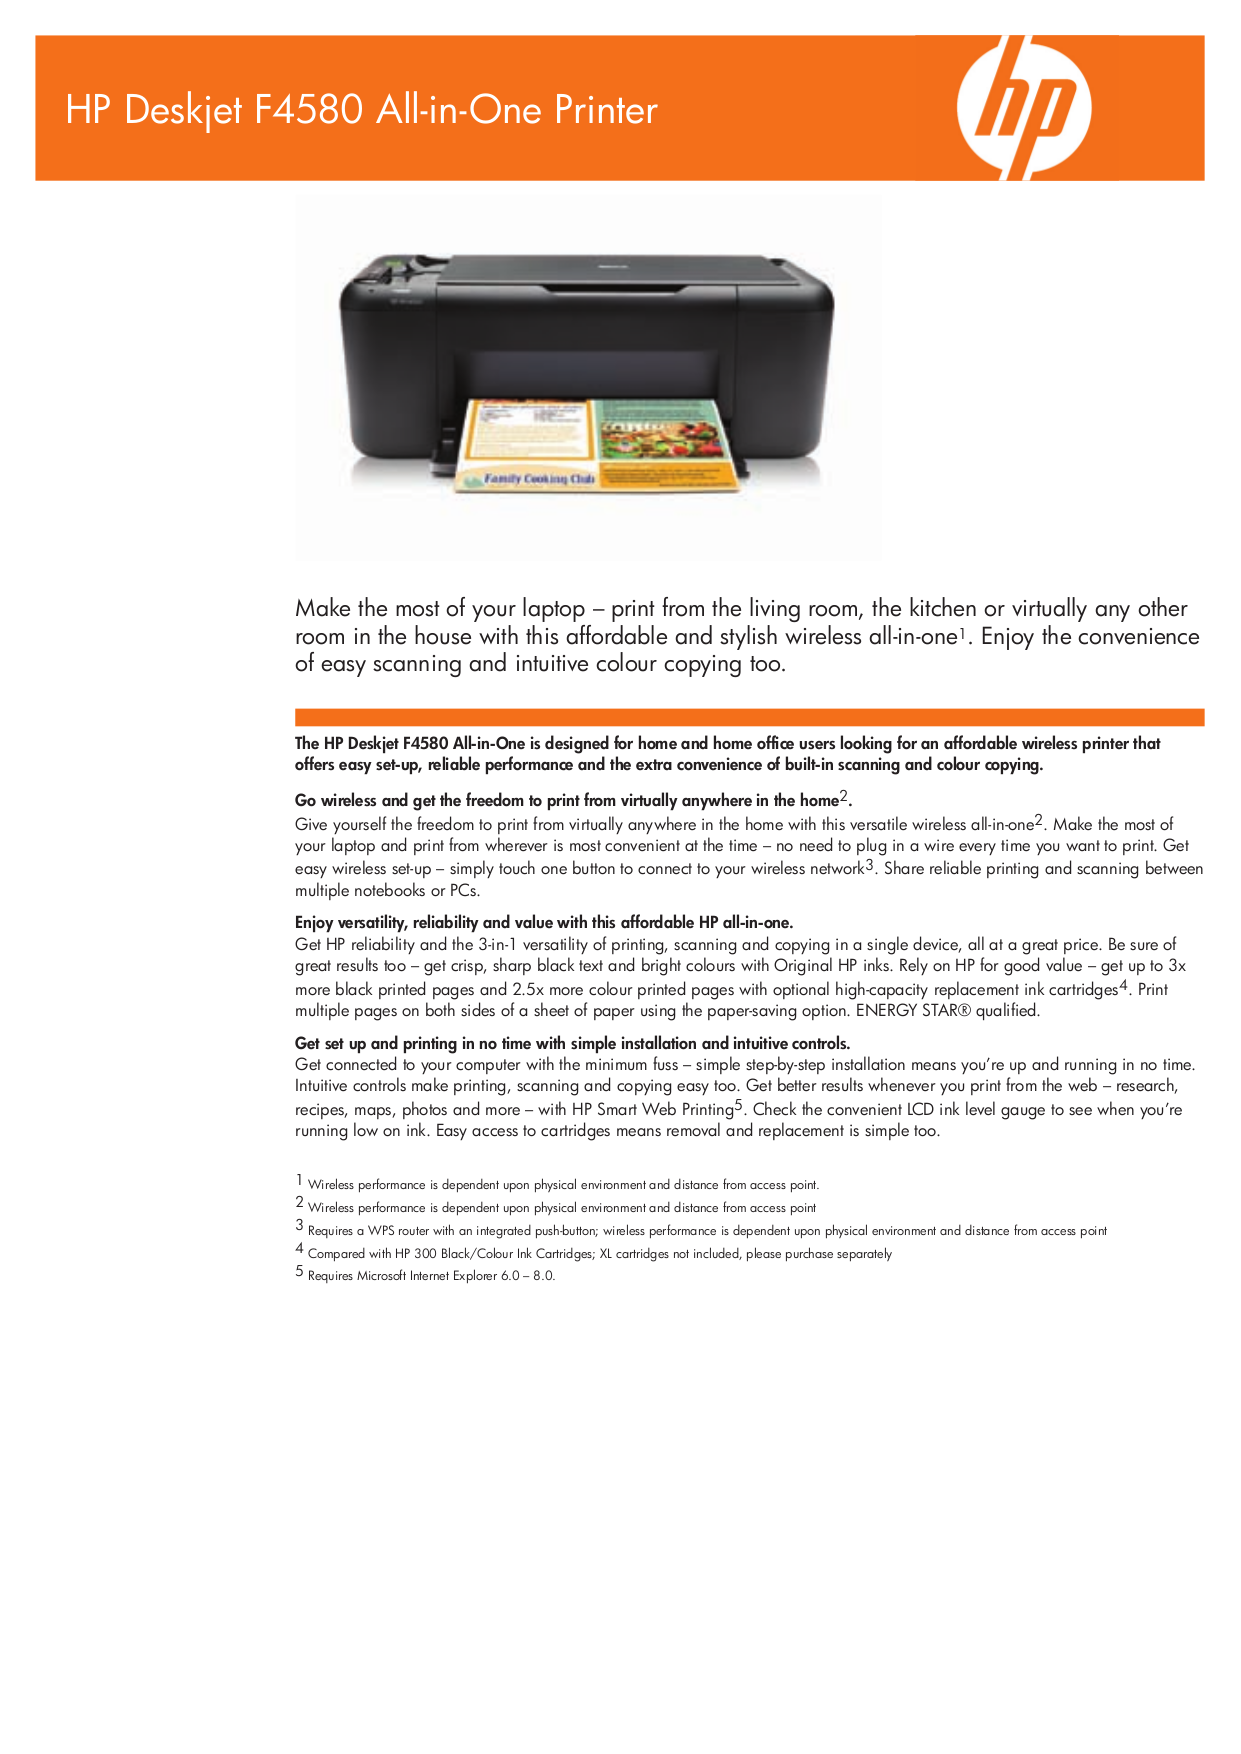 pdf for HP Multifunction Printer Deskjet F4580 manual